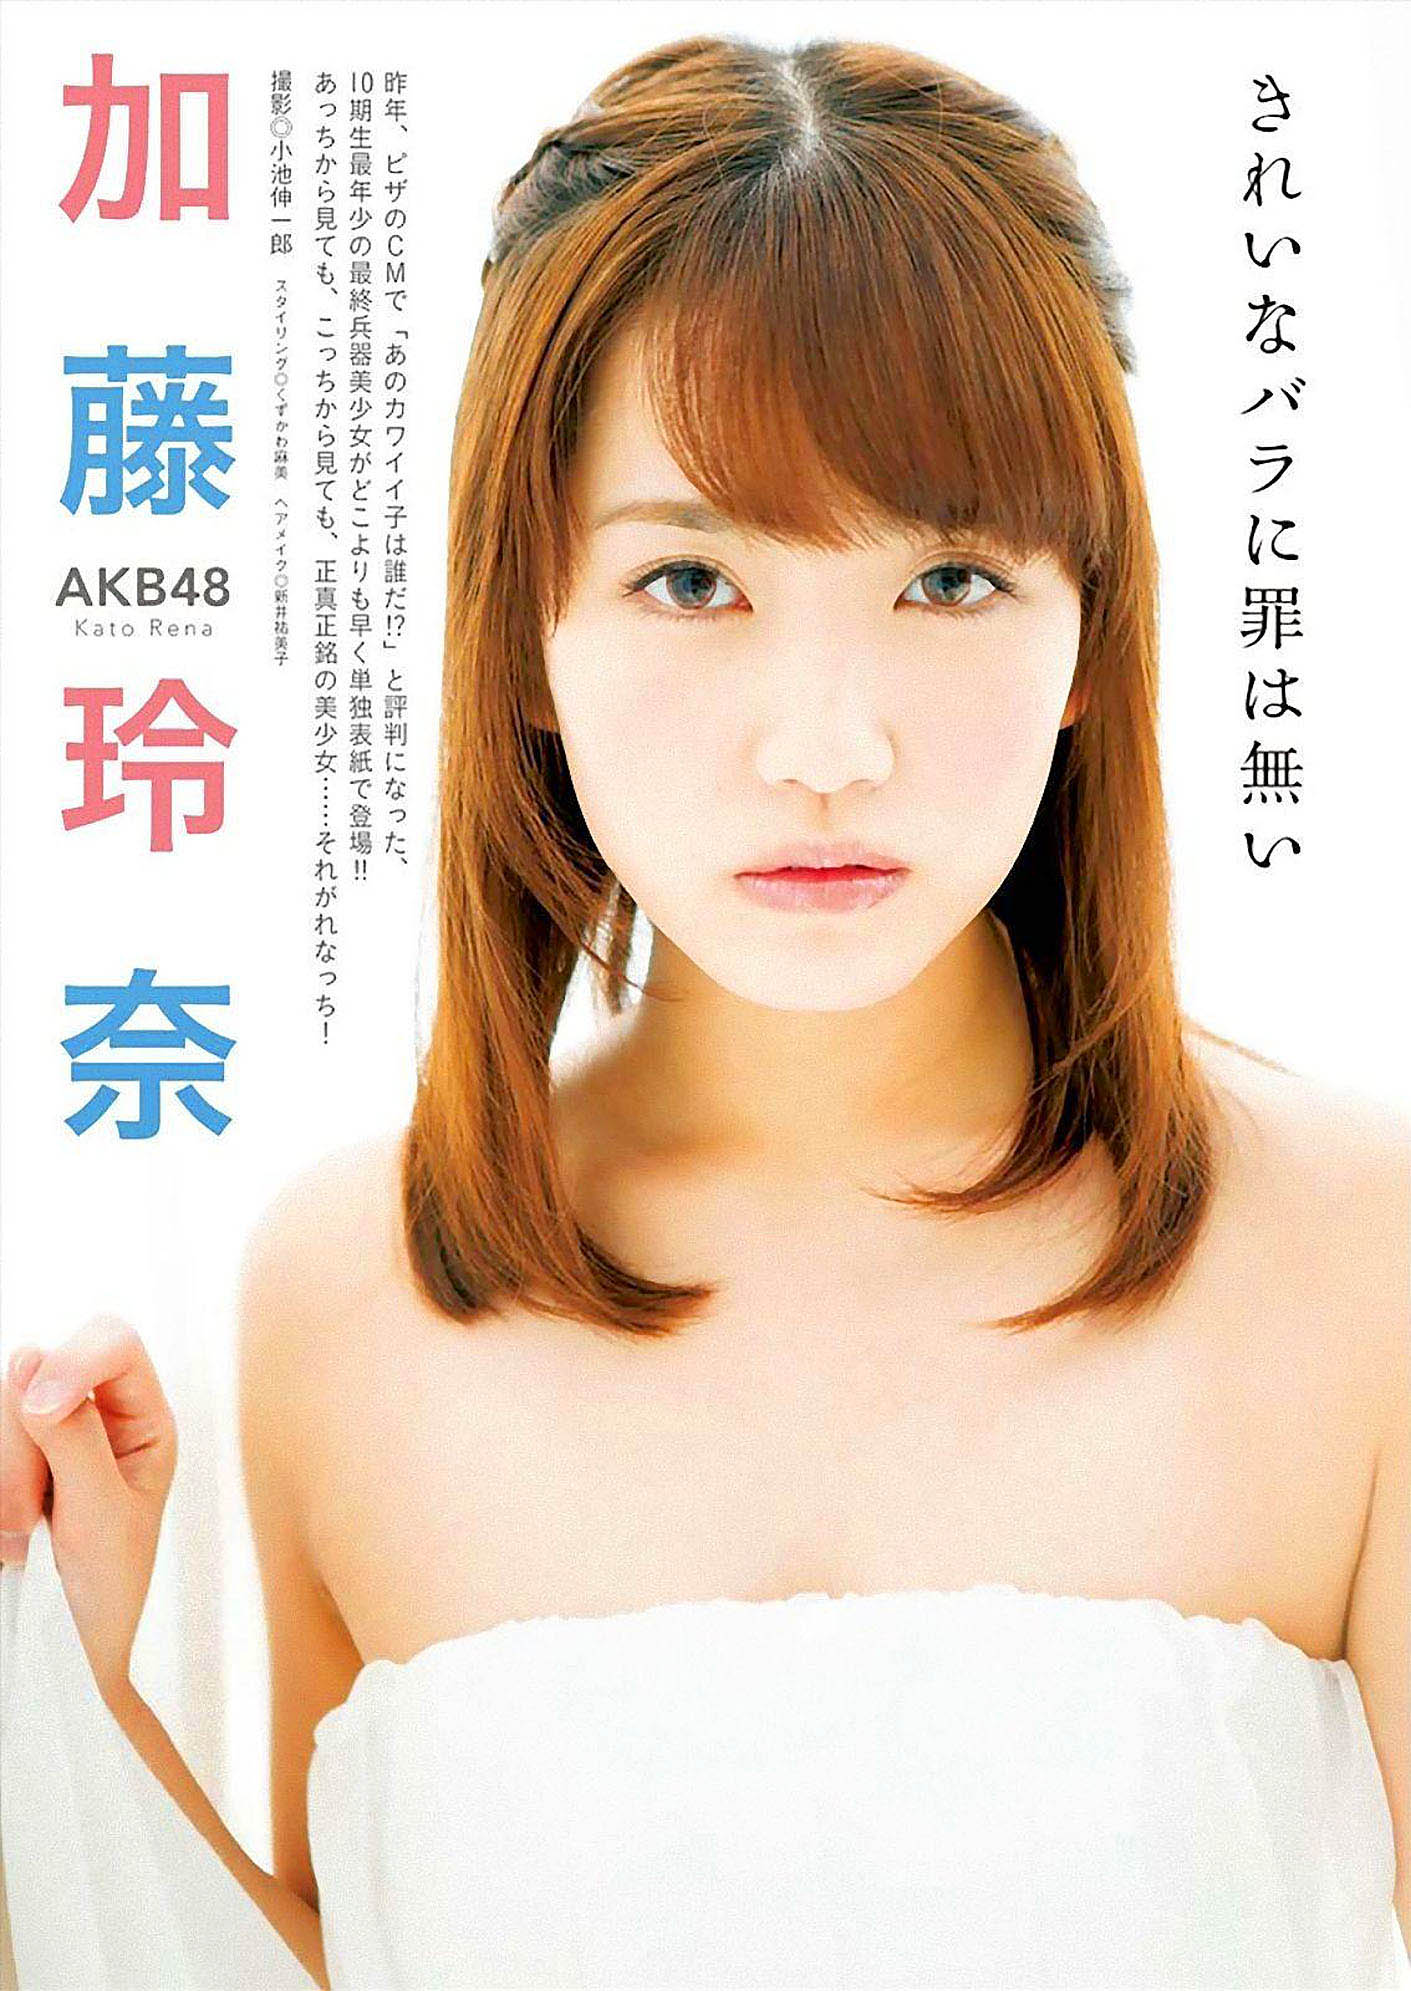 Kato Rena Manga Action 150120 02.jpg